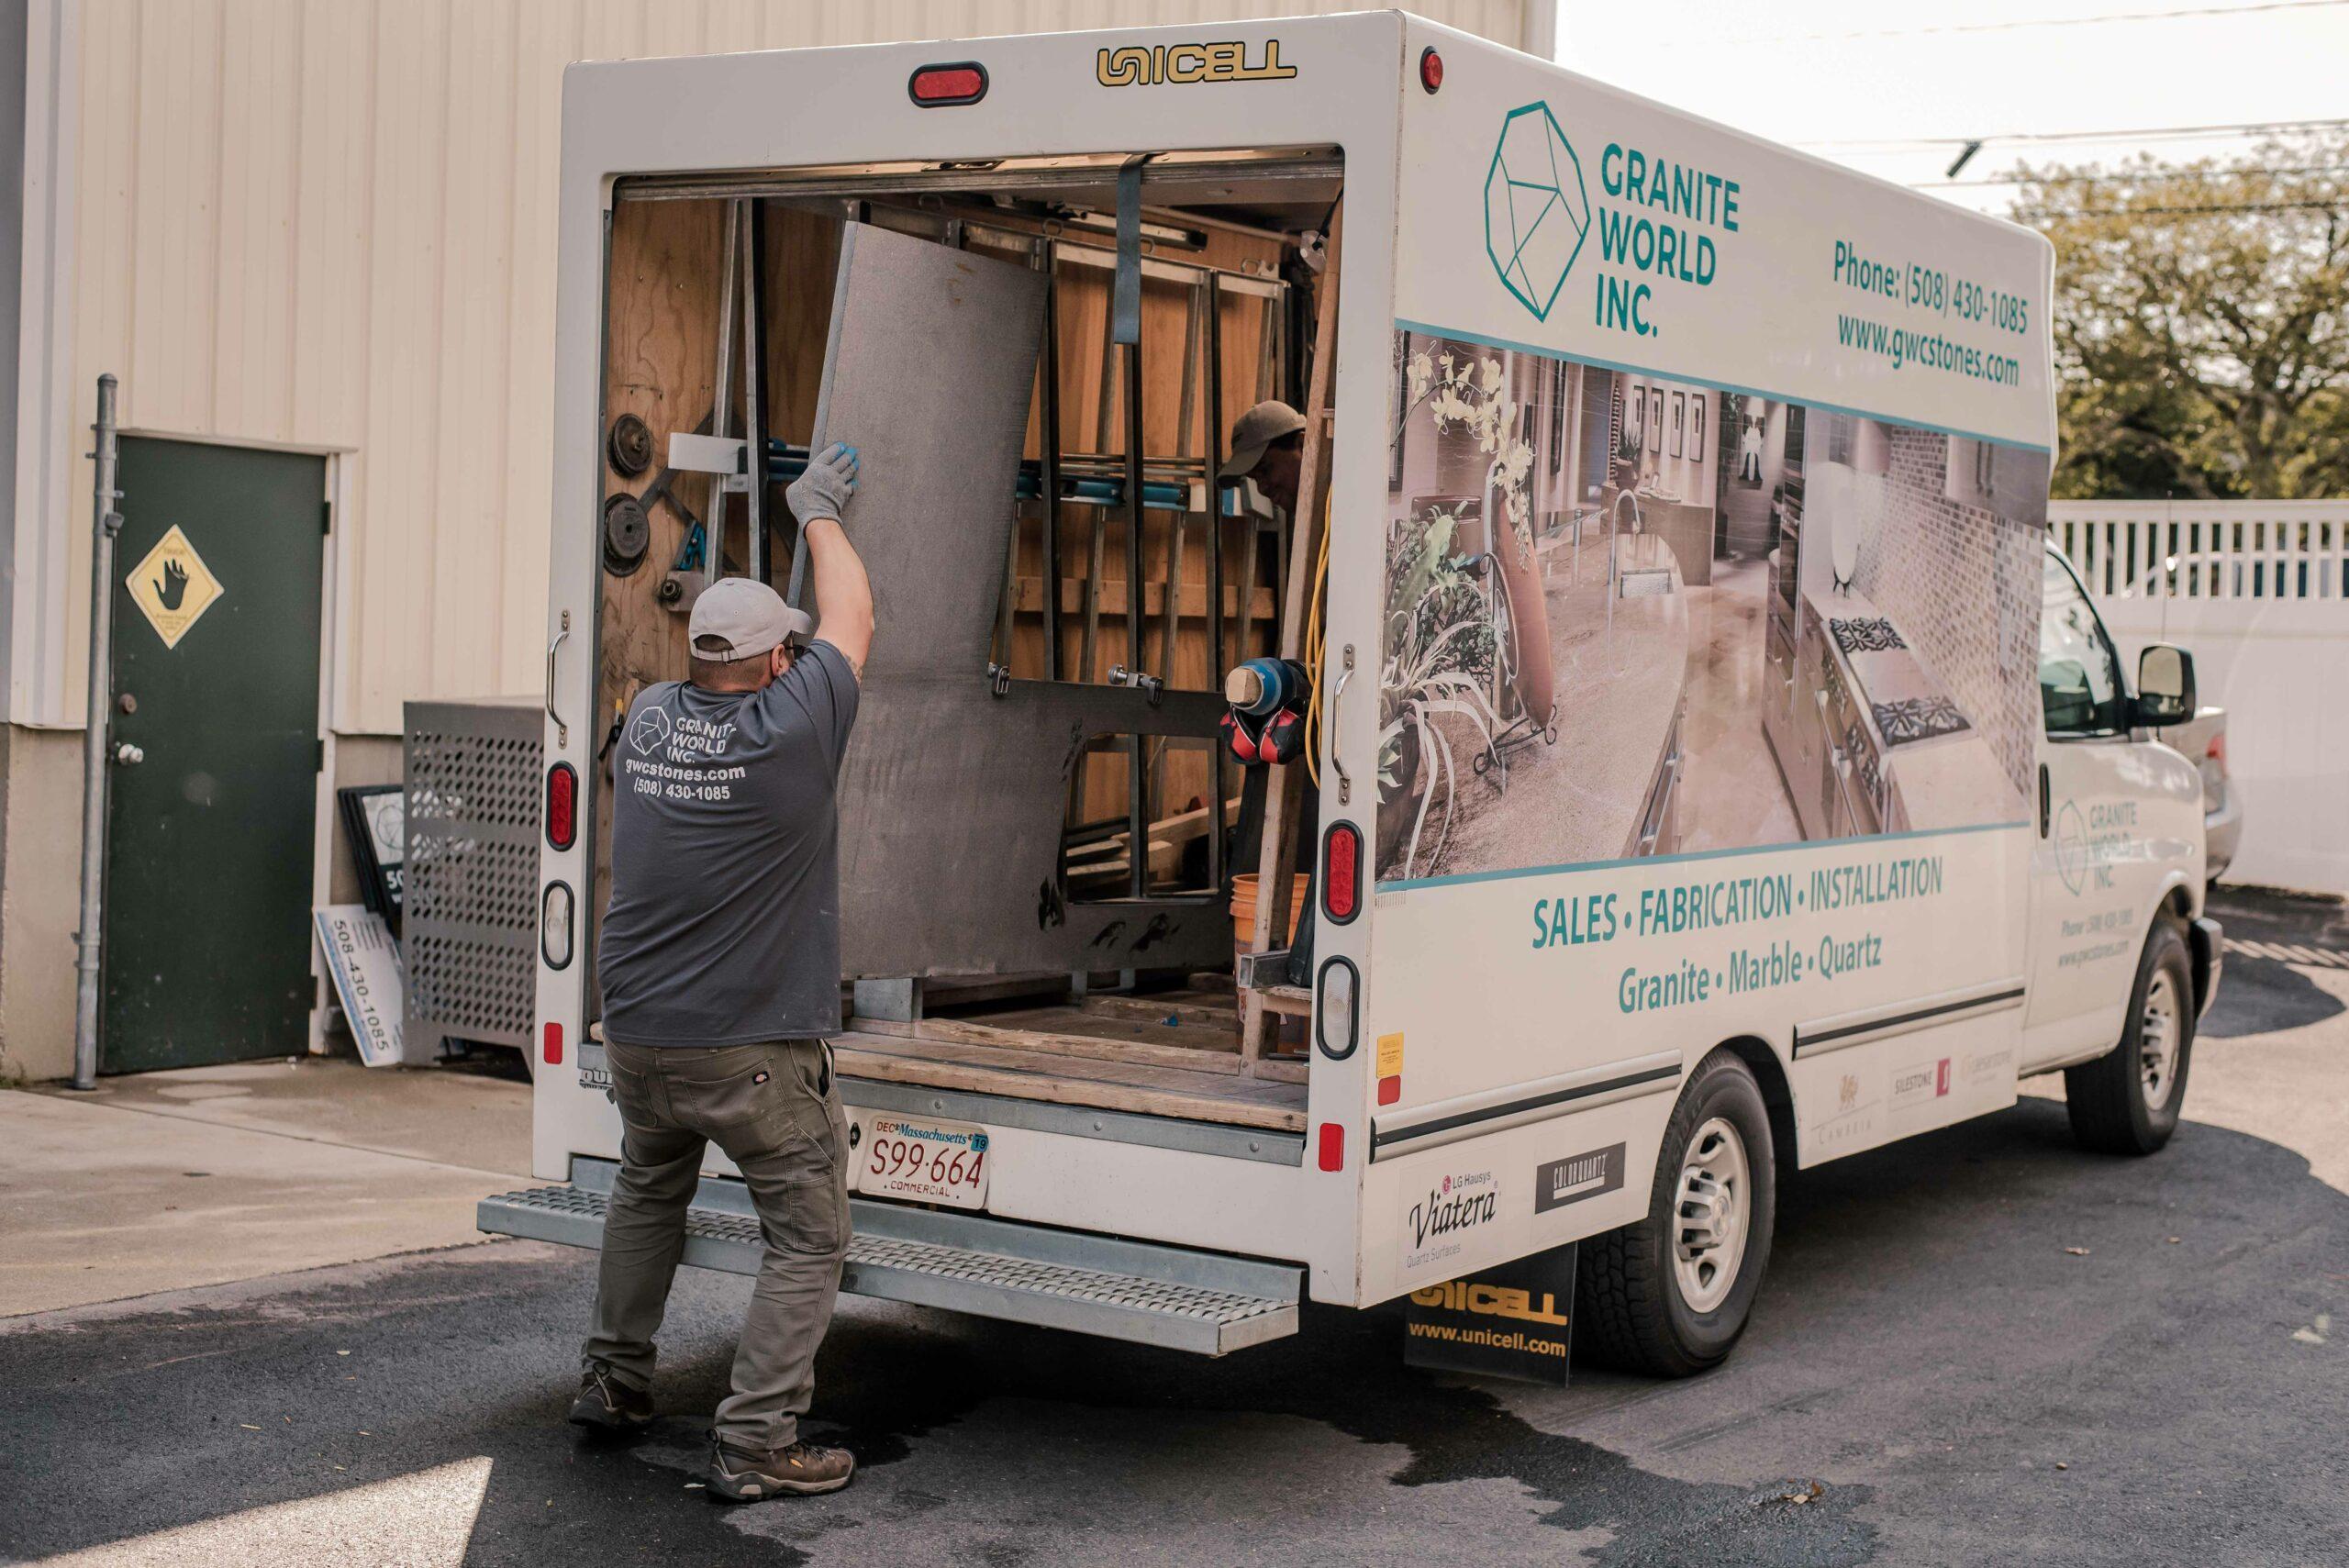 Granite World Employee Working on a countertop fabrication job, entering the GW truck